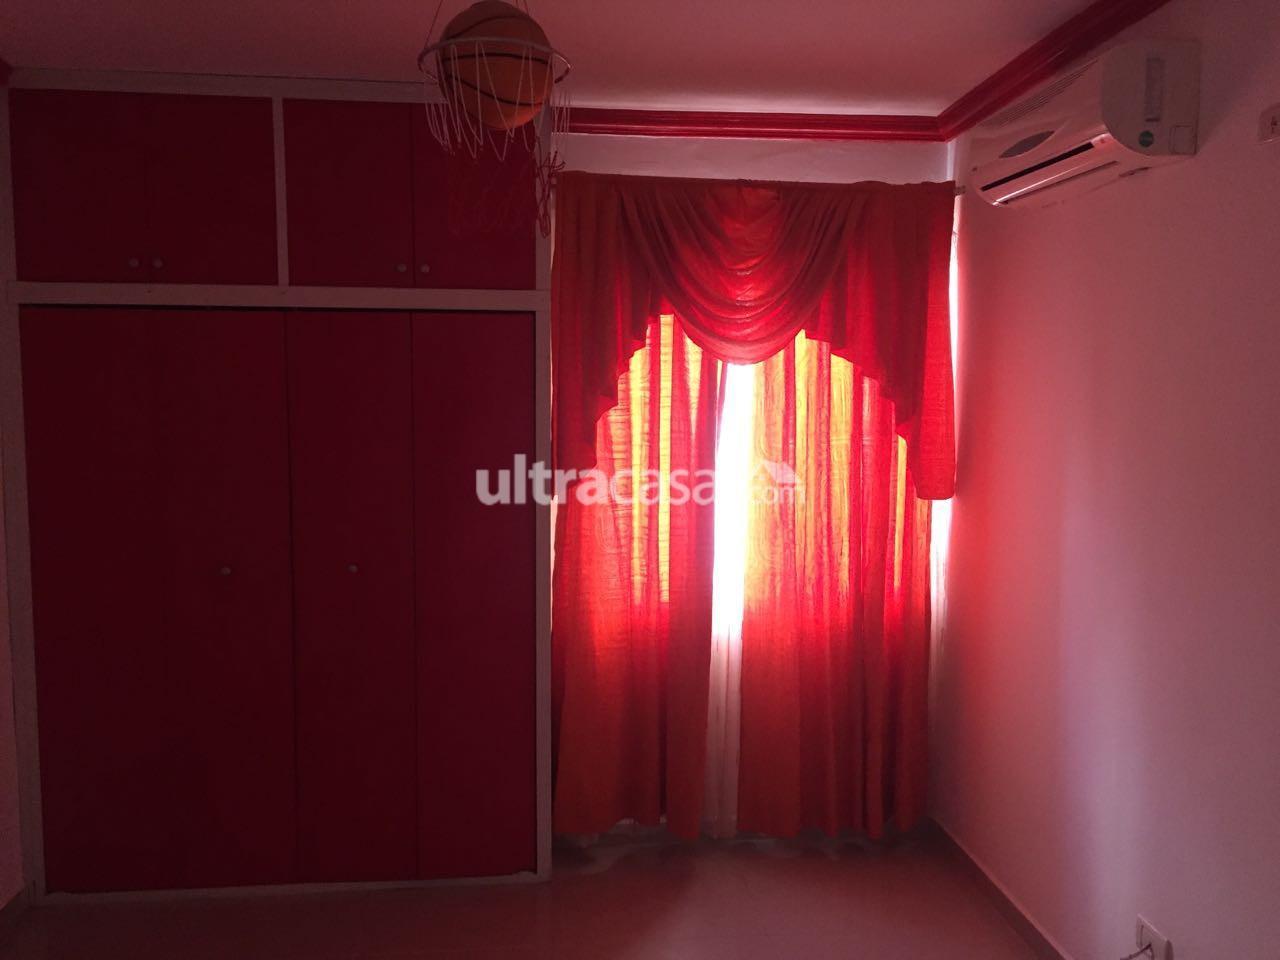 Casa en Venta Av. Banzer km, 10, condominio Sevilla Las Terazas I, calle San Pedro Oeste 24. Foto 4